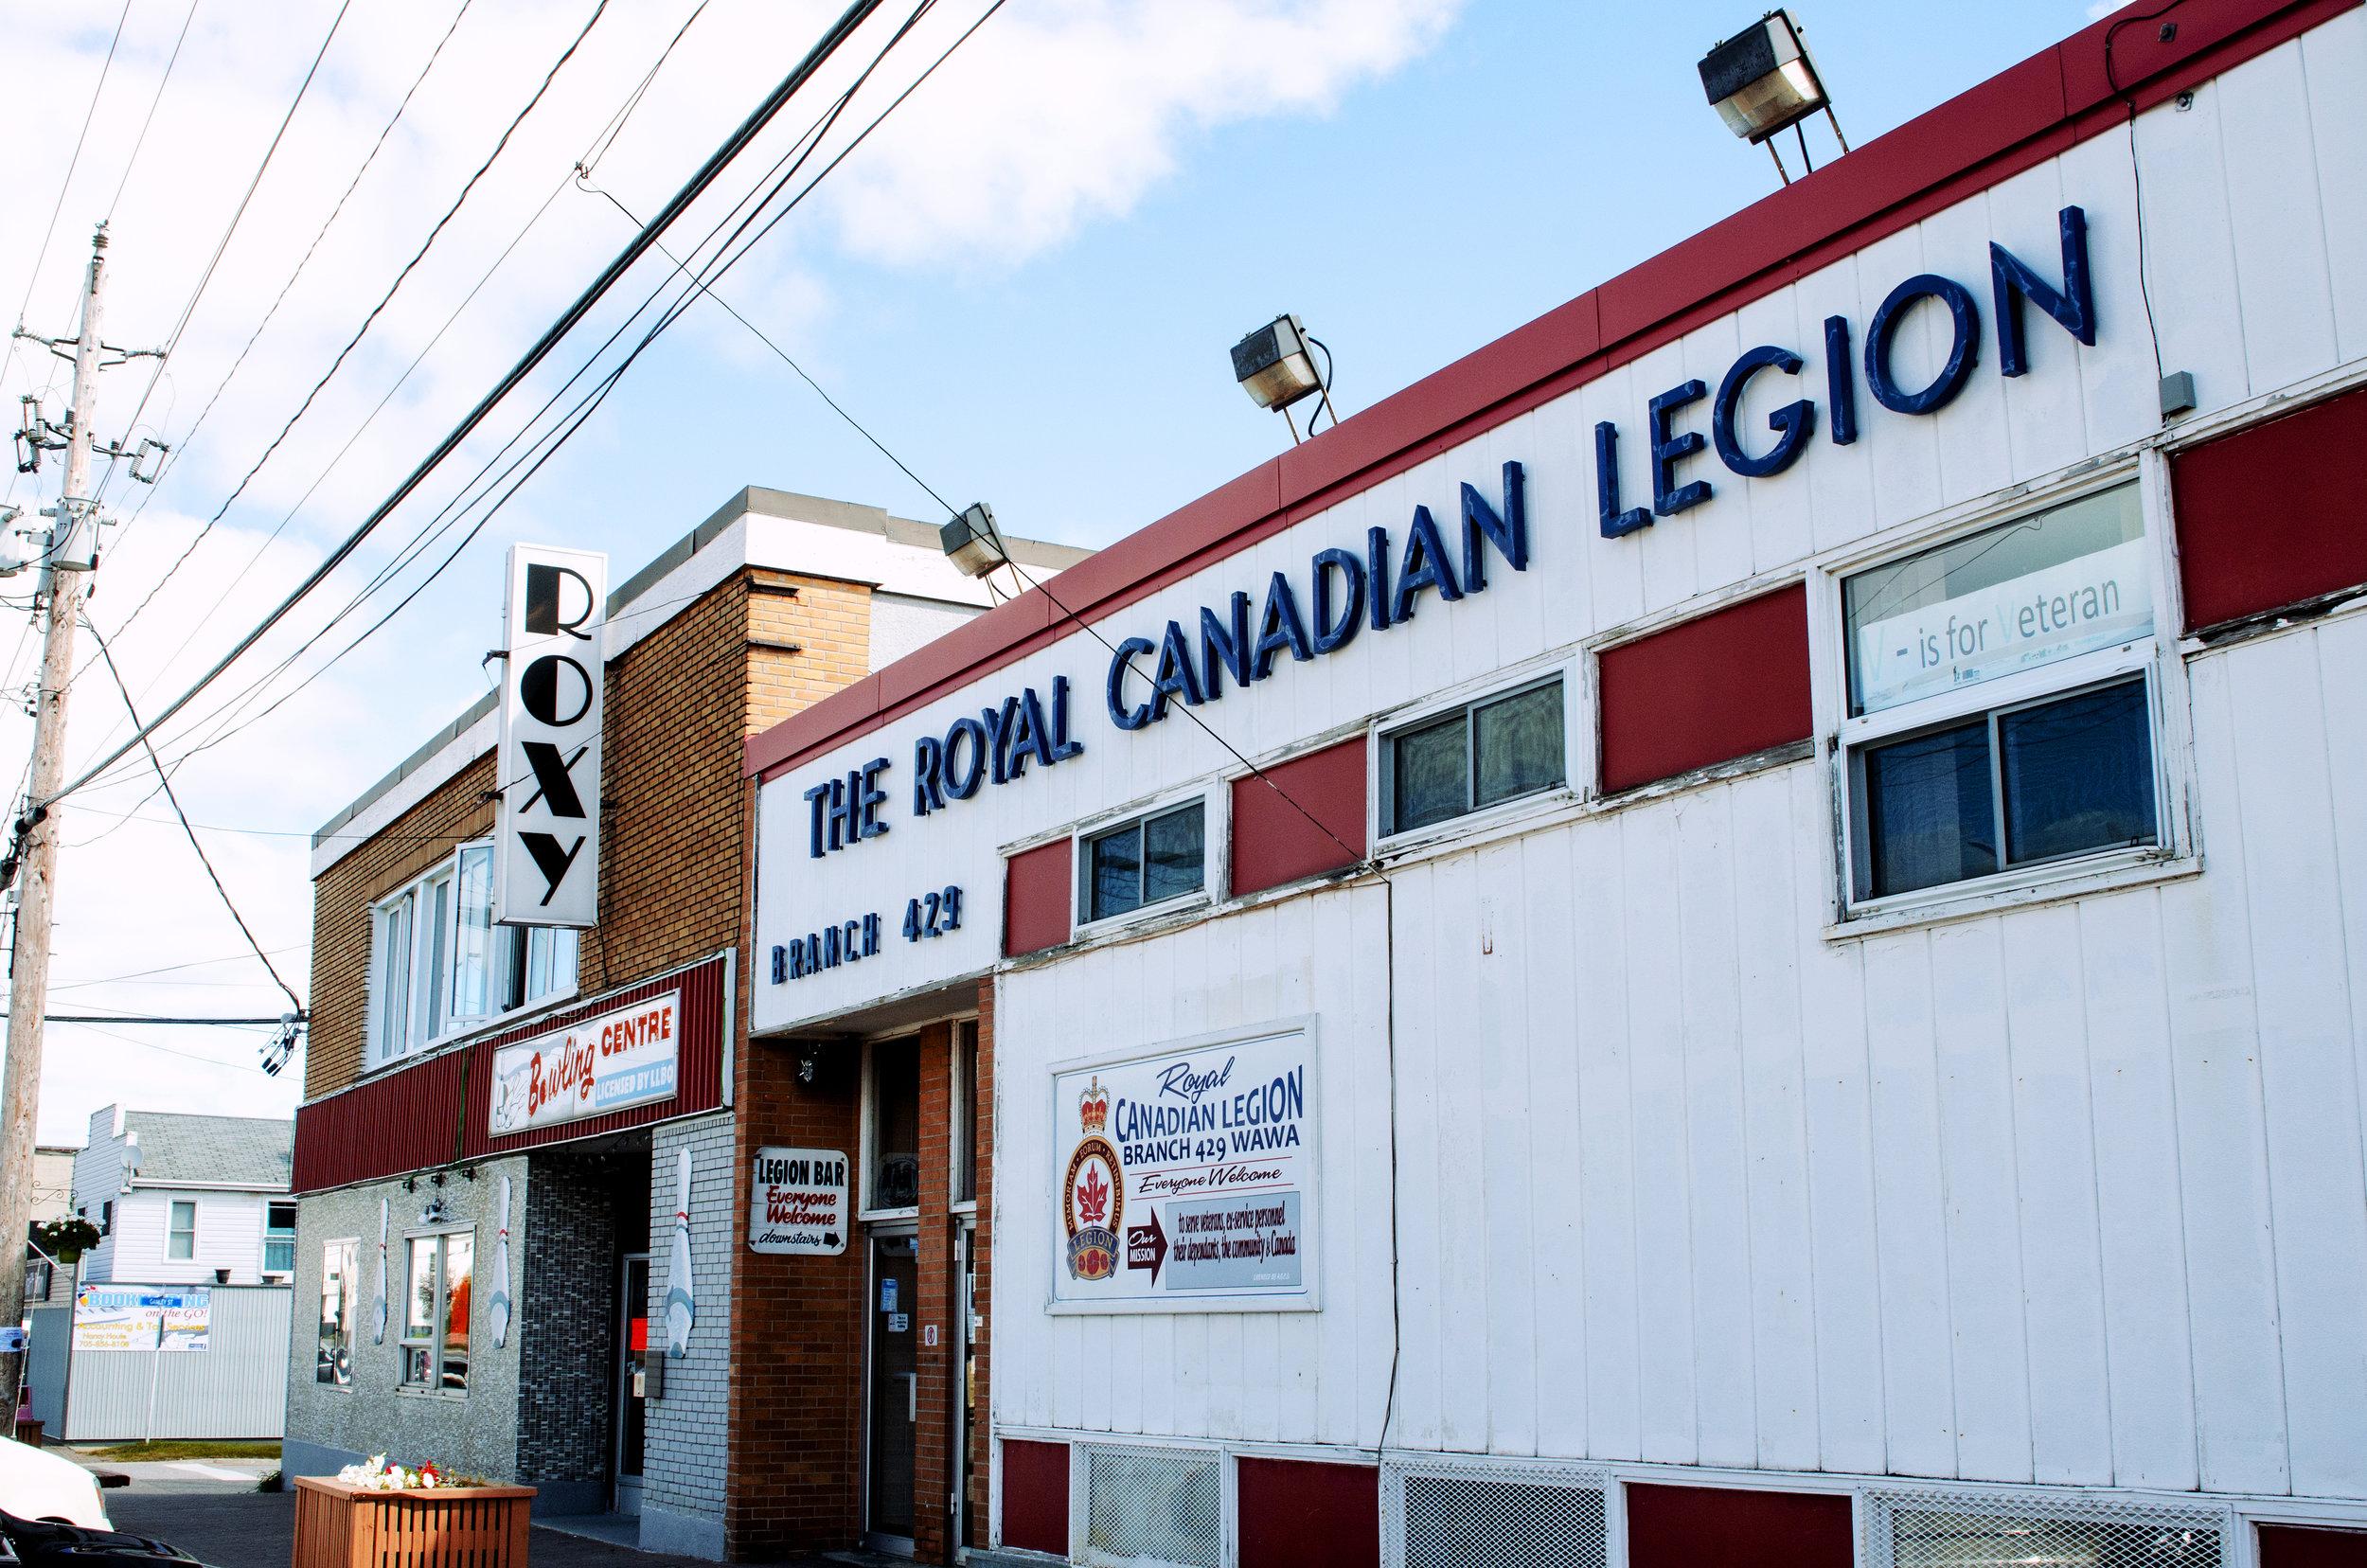 Jenkins, Cheyenne. Royal Canadian Legion. 2017. Digital Photography. Wawa, Ontario